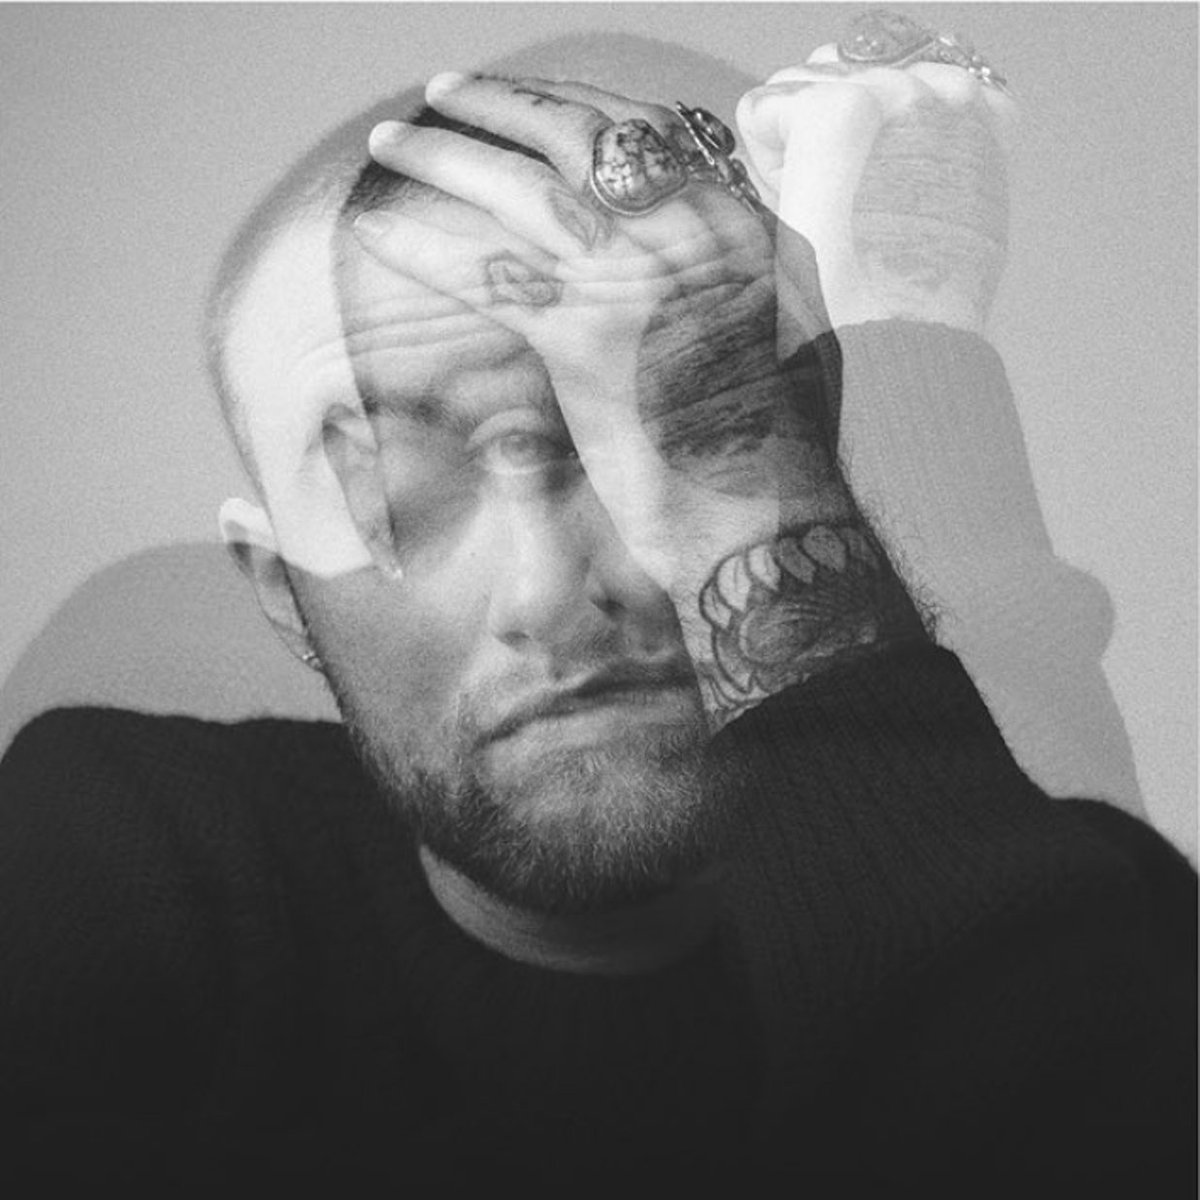 mac miller's new album #circles is here 💙